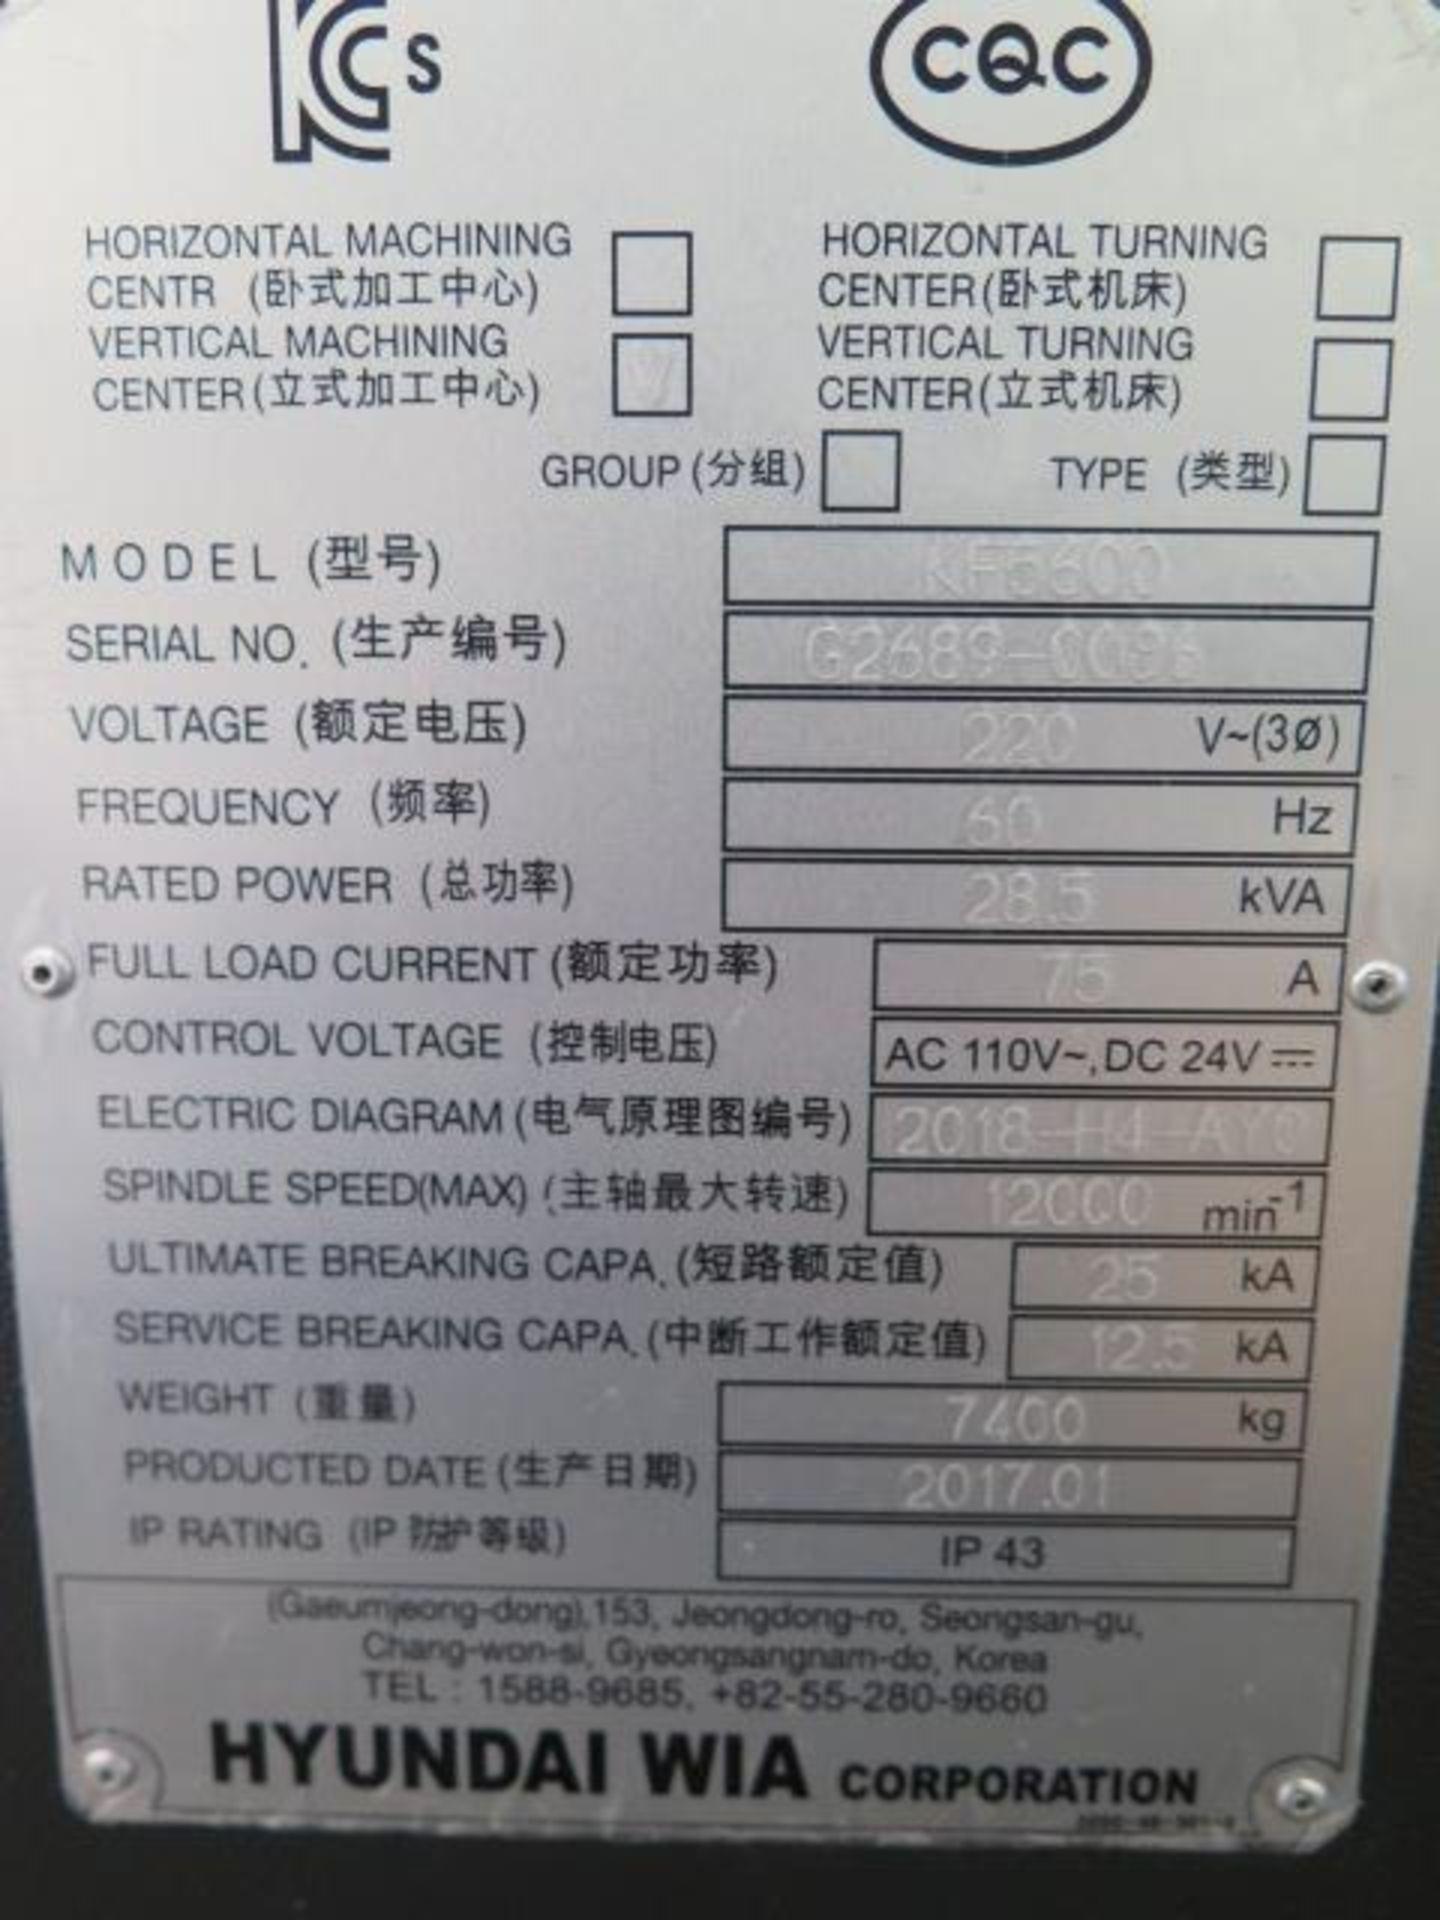 2017 Hyundai WIA KF5600 CNC VMC s/n G2689-0086 w/ Hyundai WIA Fanuc i-Series, SOLD AS IS - Image 22 of 22